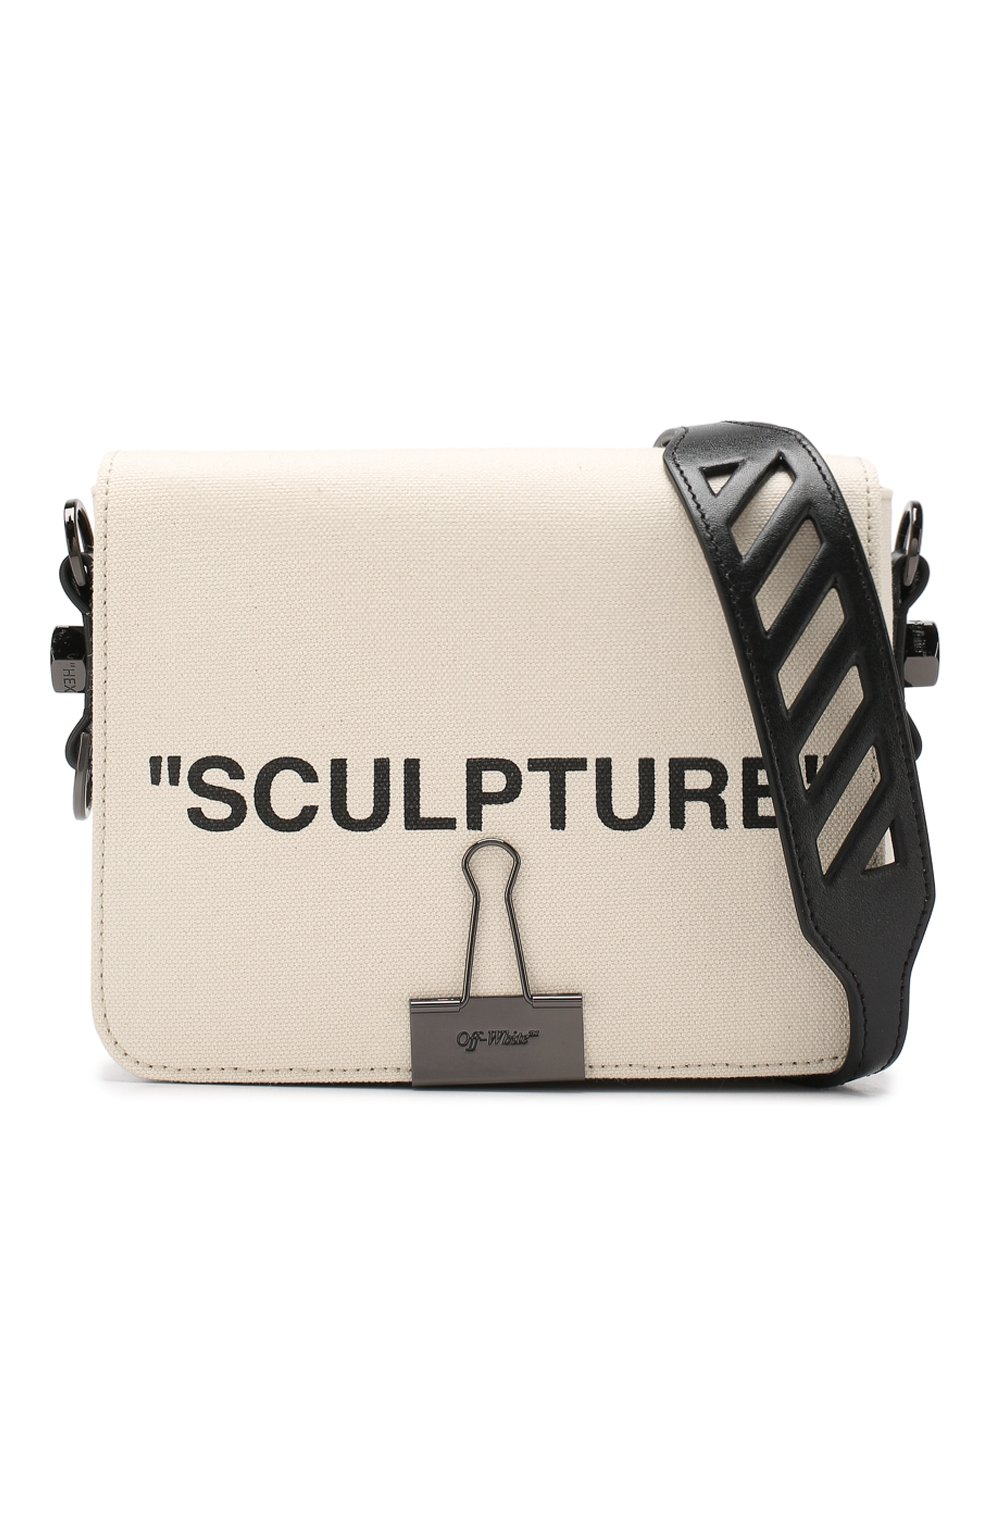 Сумка Sculpture Binder Clip Off-White бежевая цвета   Фото №6